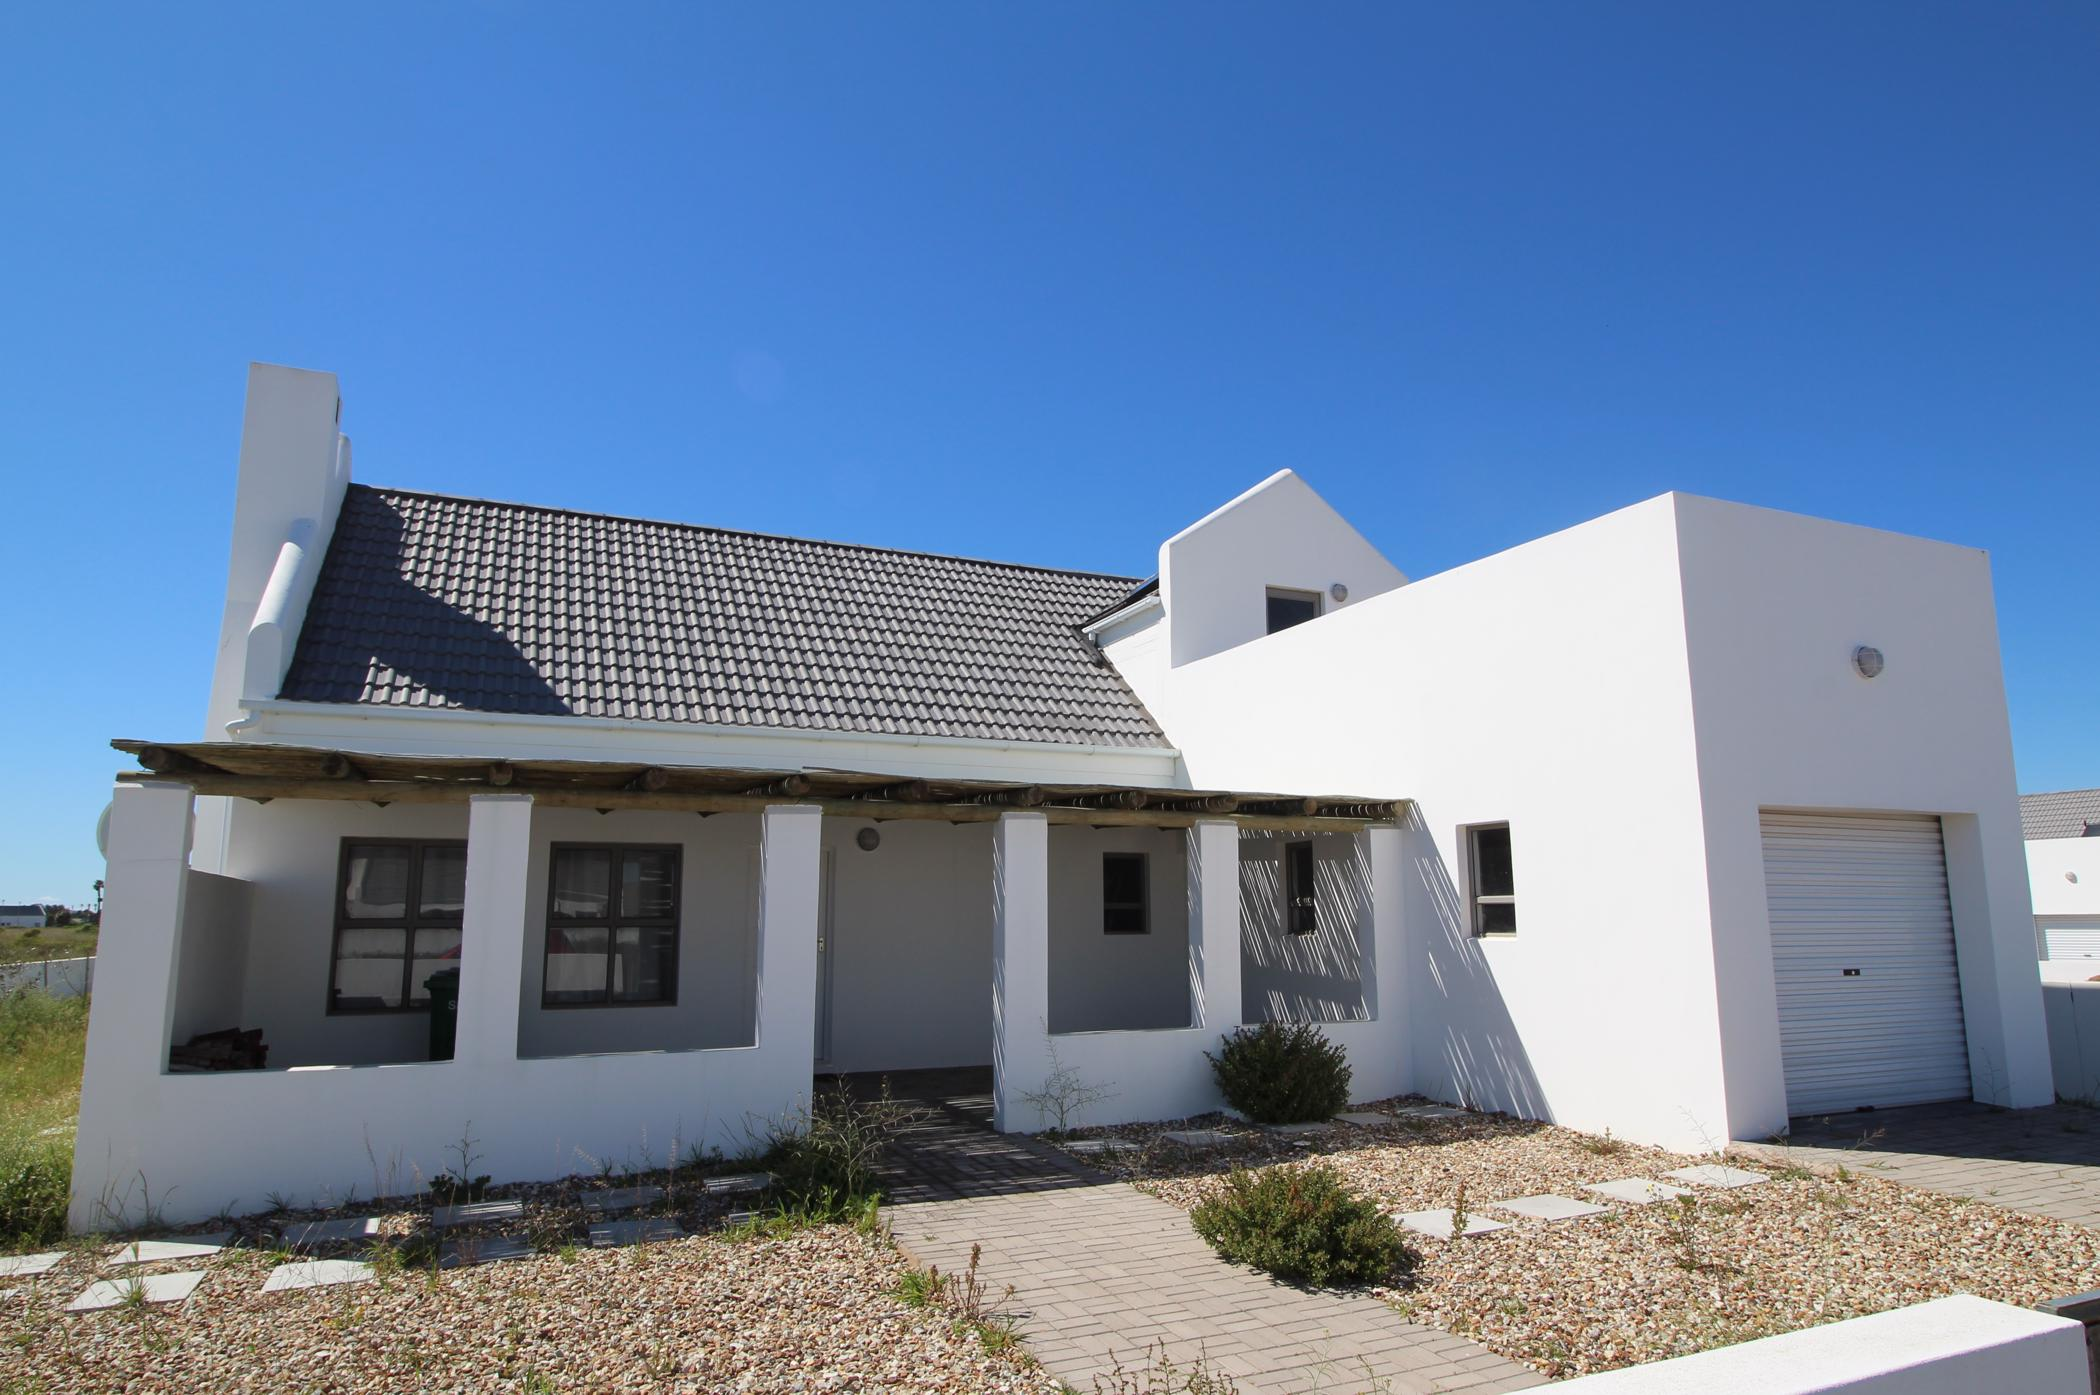 3 bedroom house for sale in Golden Mile